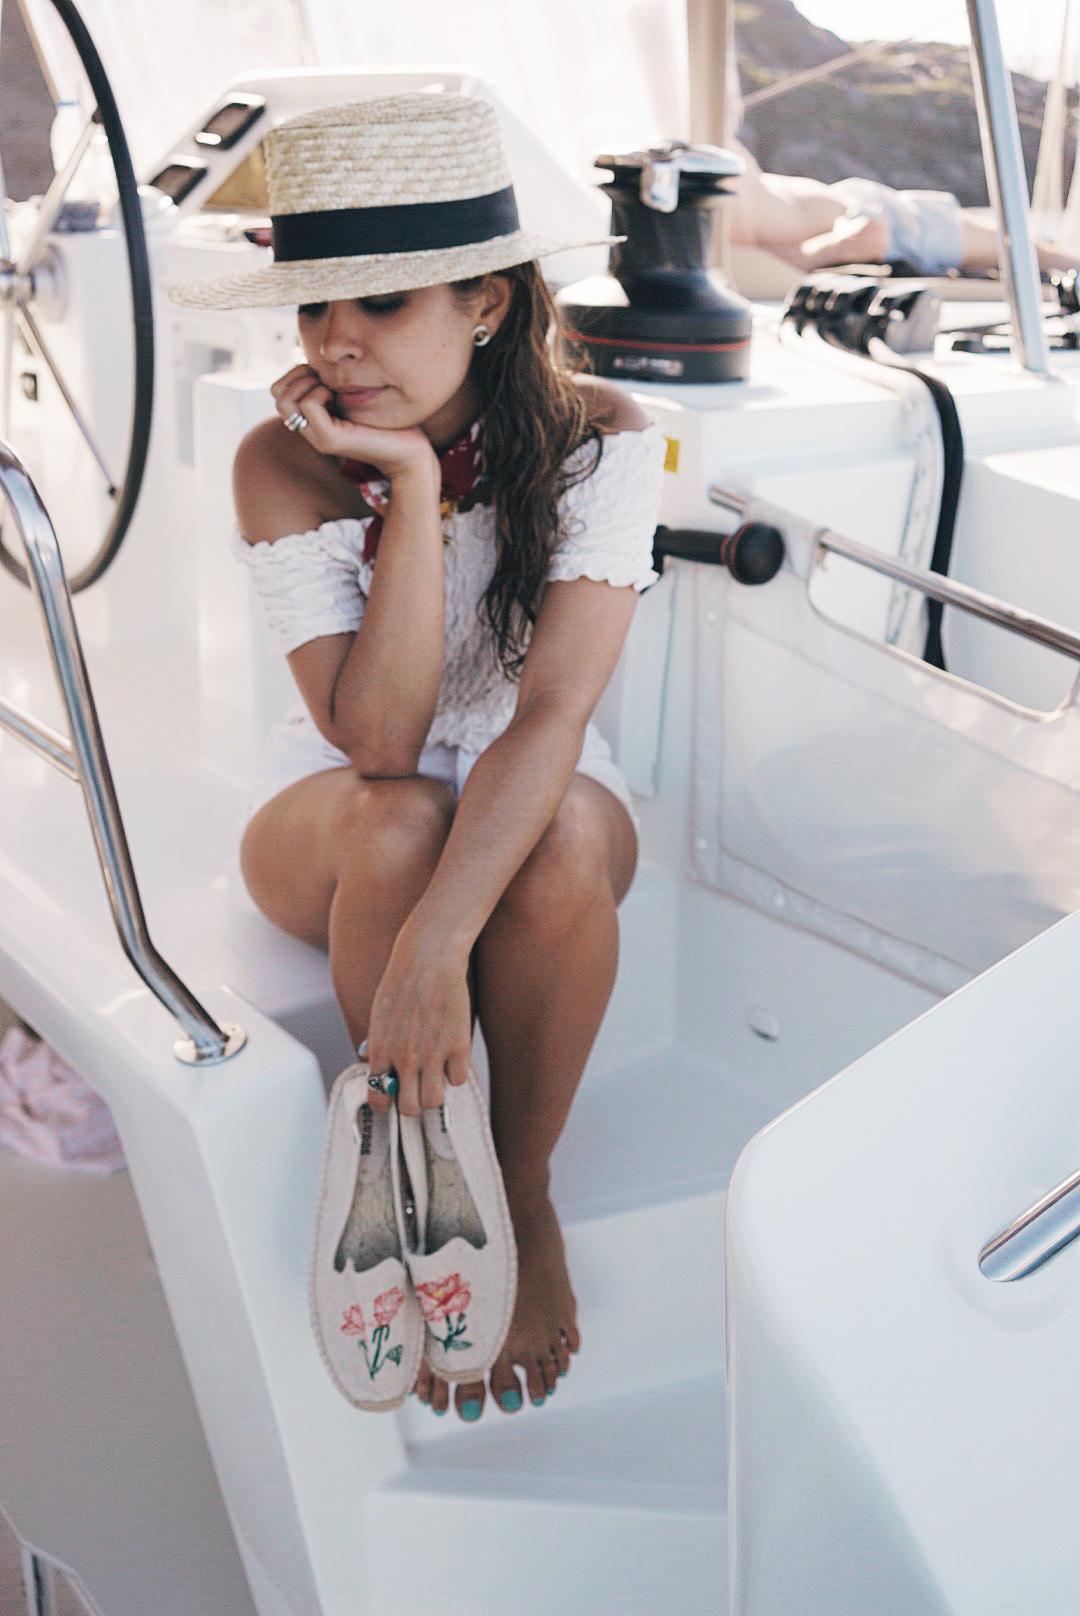 Soludos_Escapes-Boat_Trip-Bikini-Summer_Look-Santorini_Greece-GRLFRND_Jeans-Off_The_Shoulders-Collage_Vintage-Street_Style-Soludos_Espadrilles-132